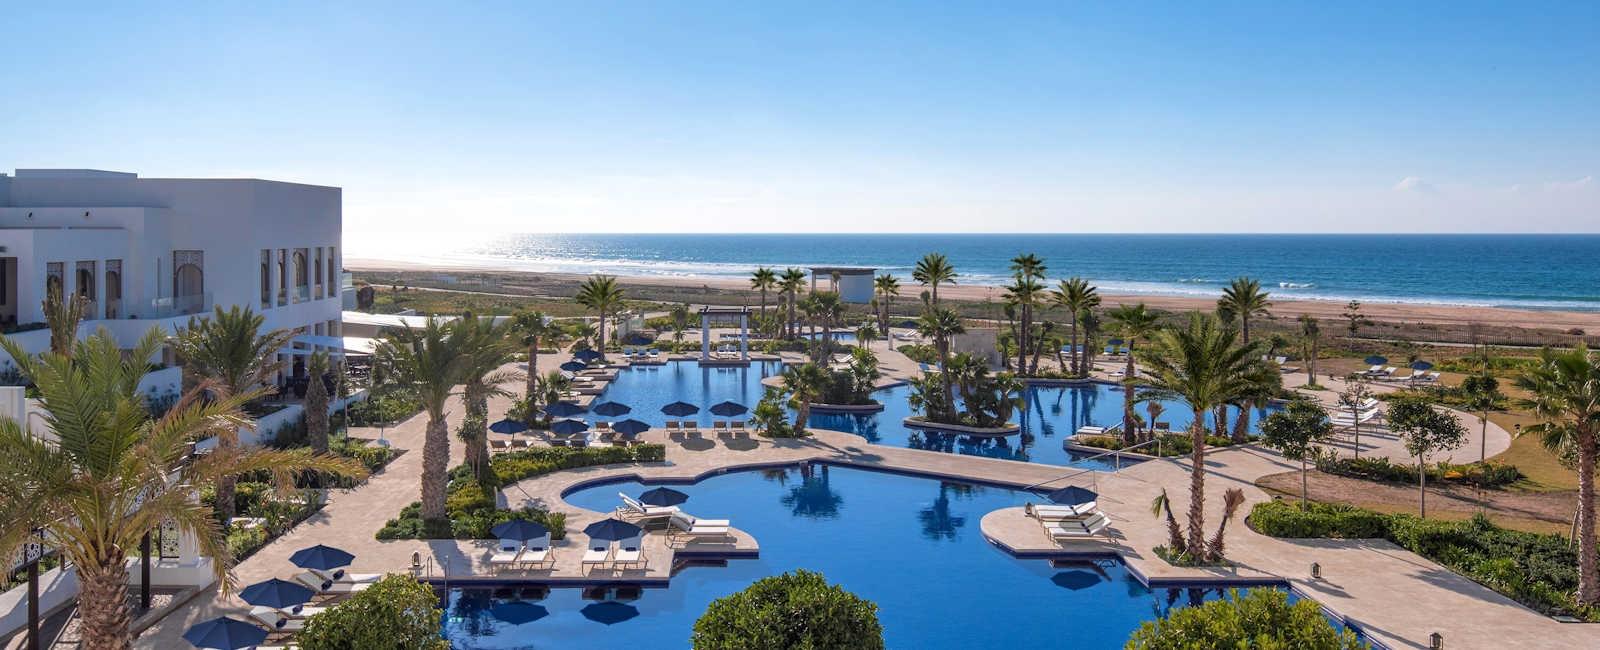 Luxury Al Houara Holidays